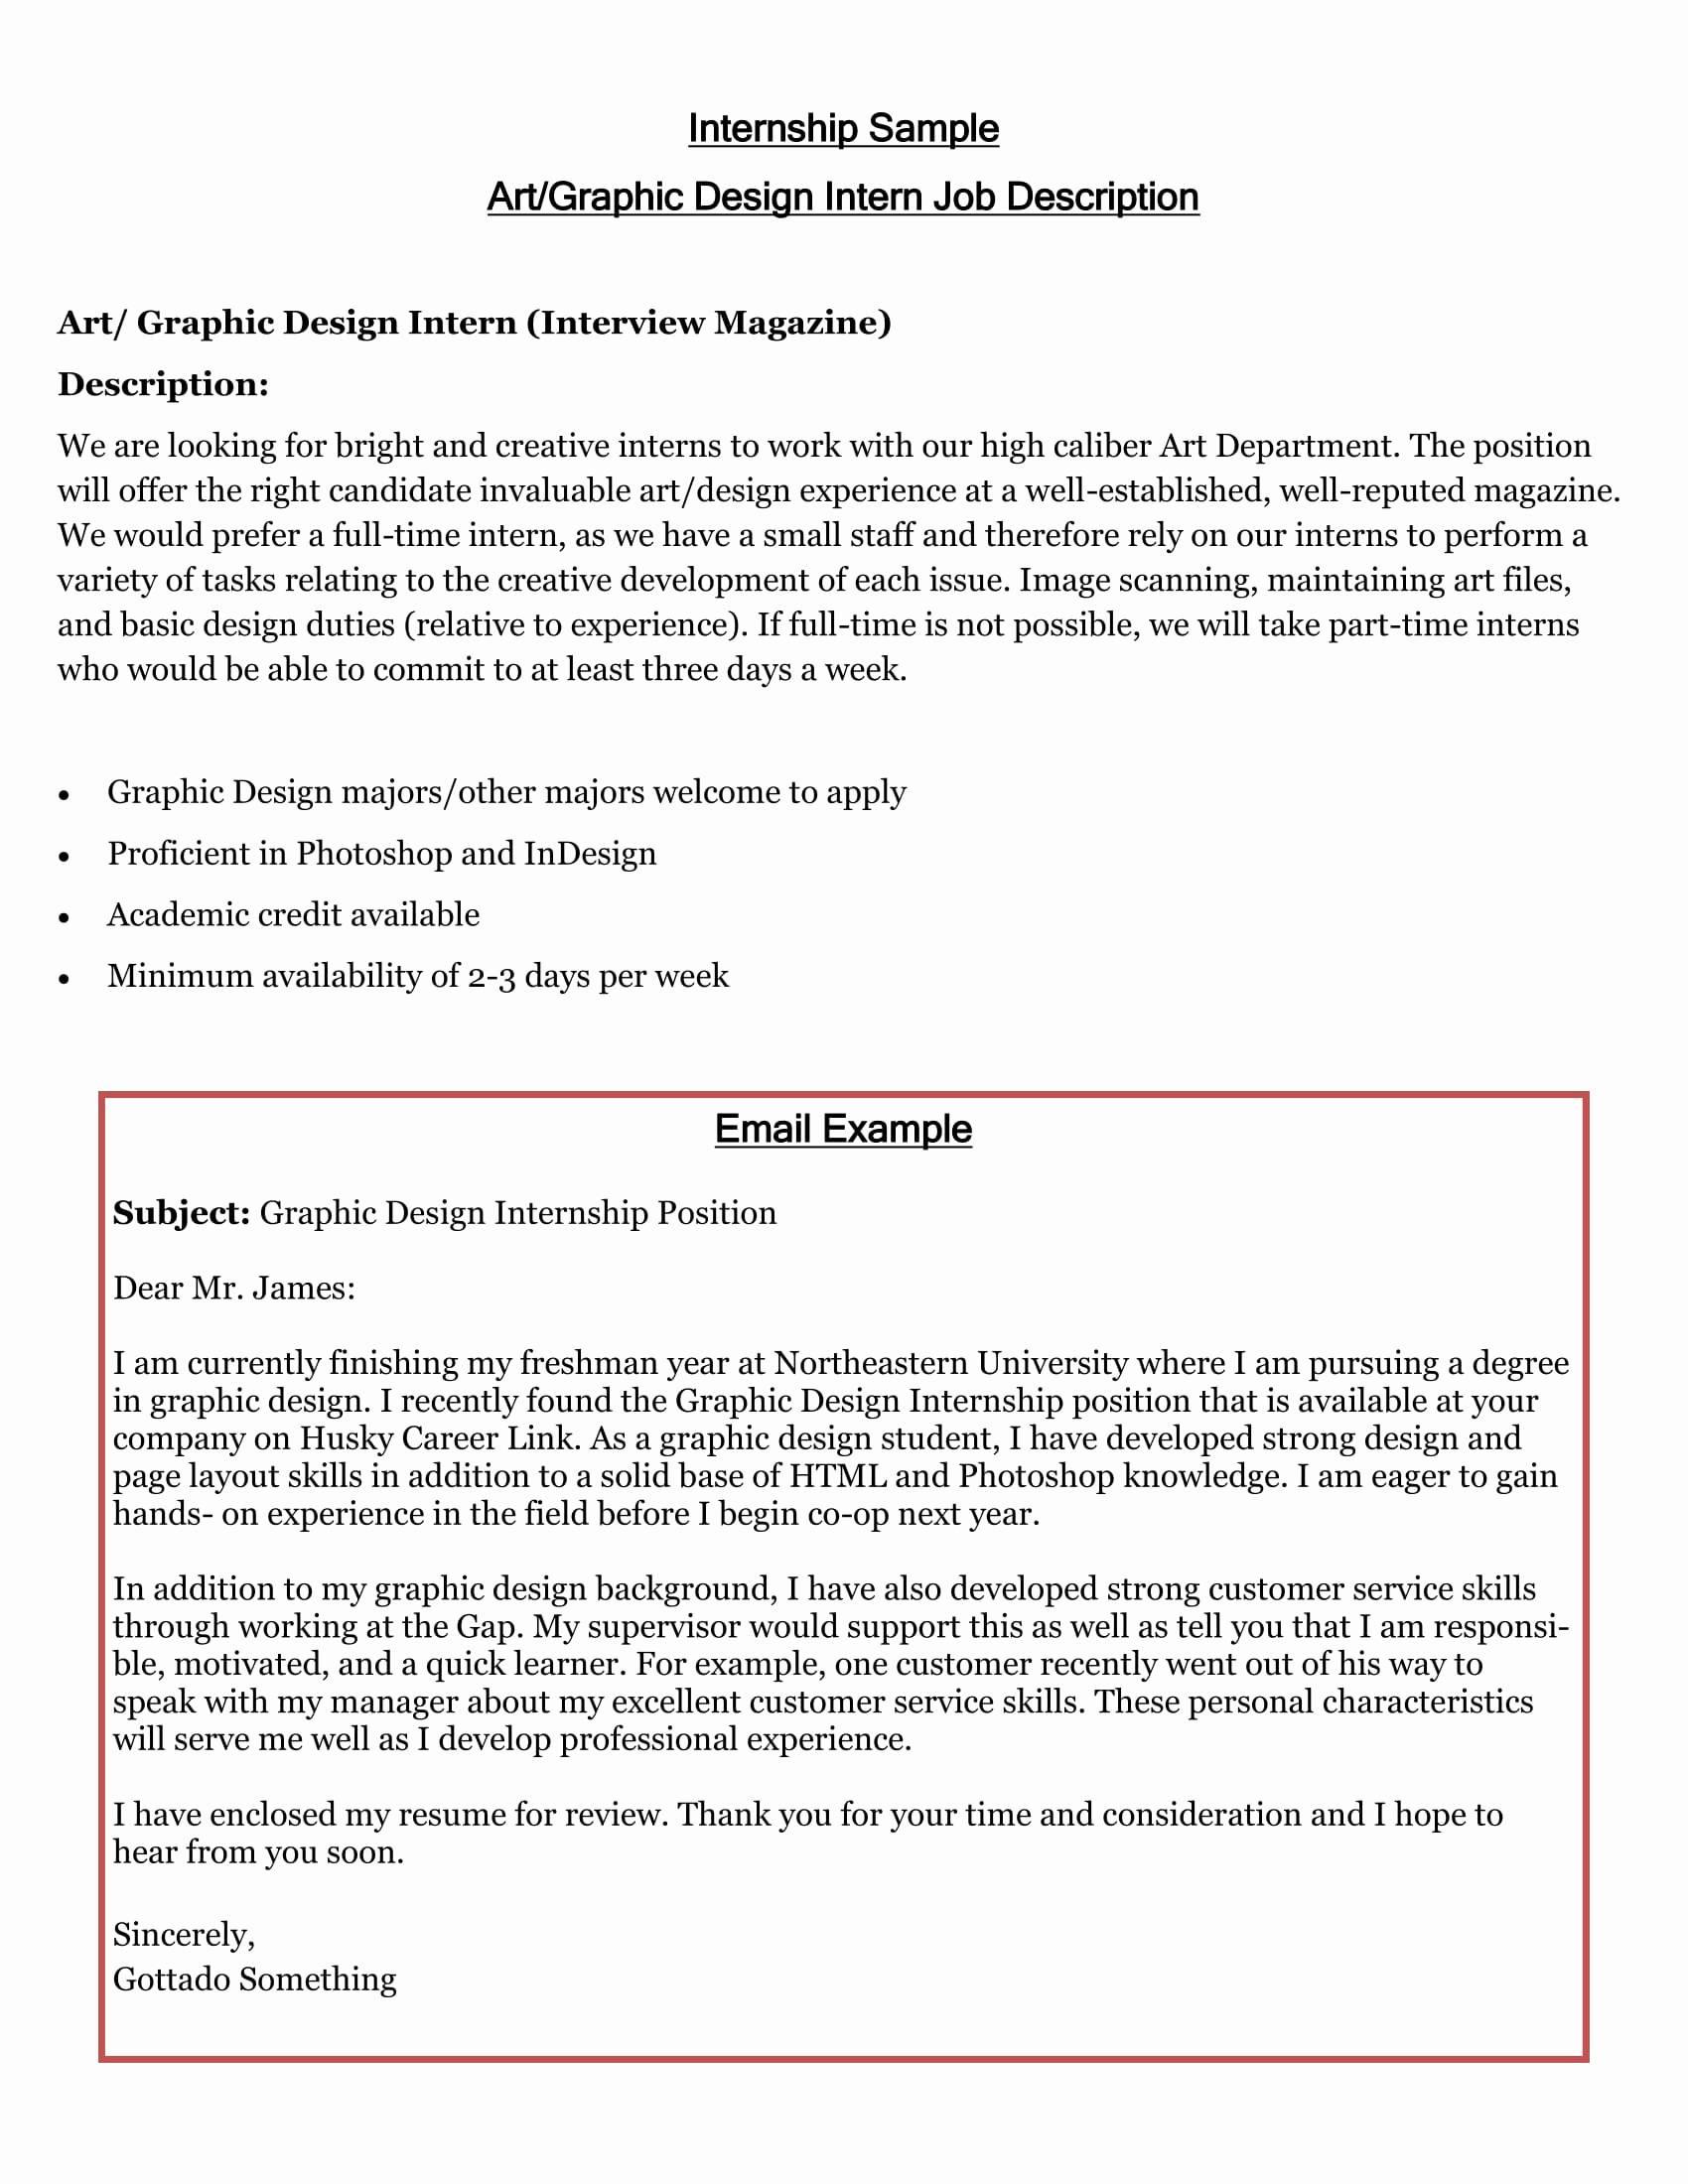 Internship Spreadsheet With Internship Cover Letters Unique Art Internship Cover Letter New